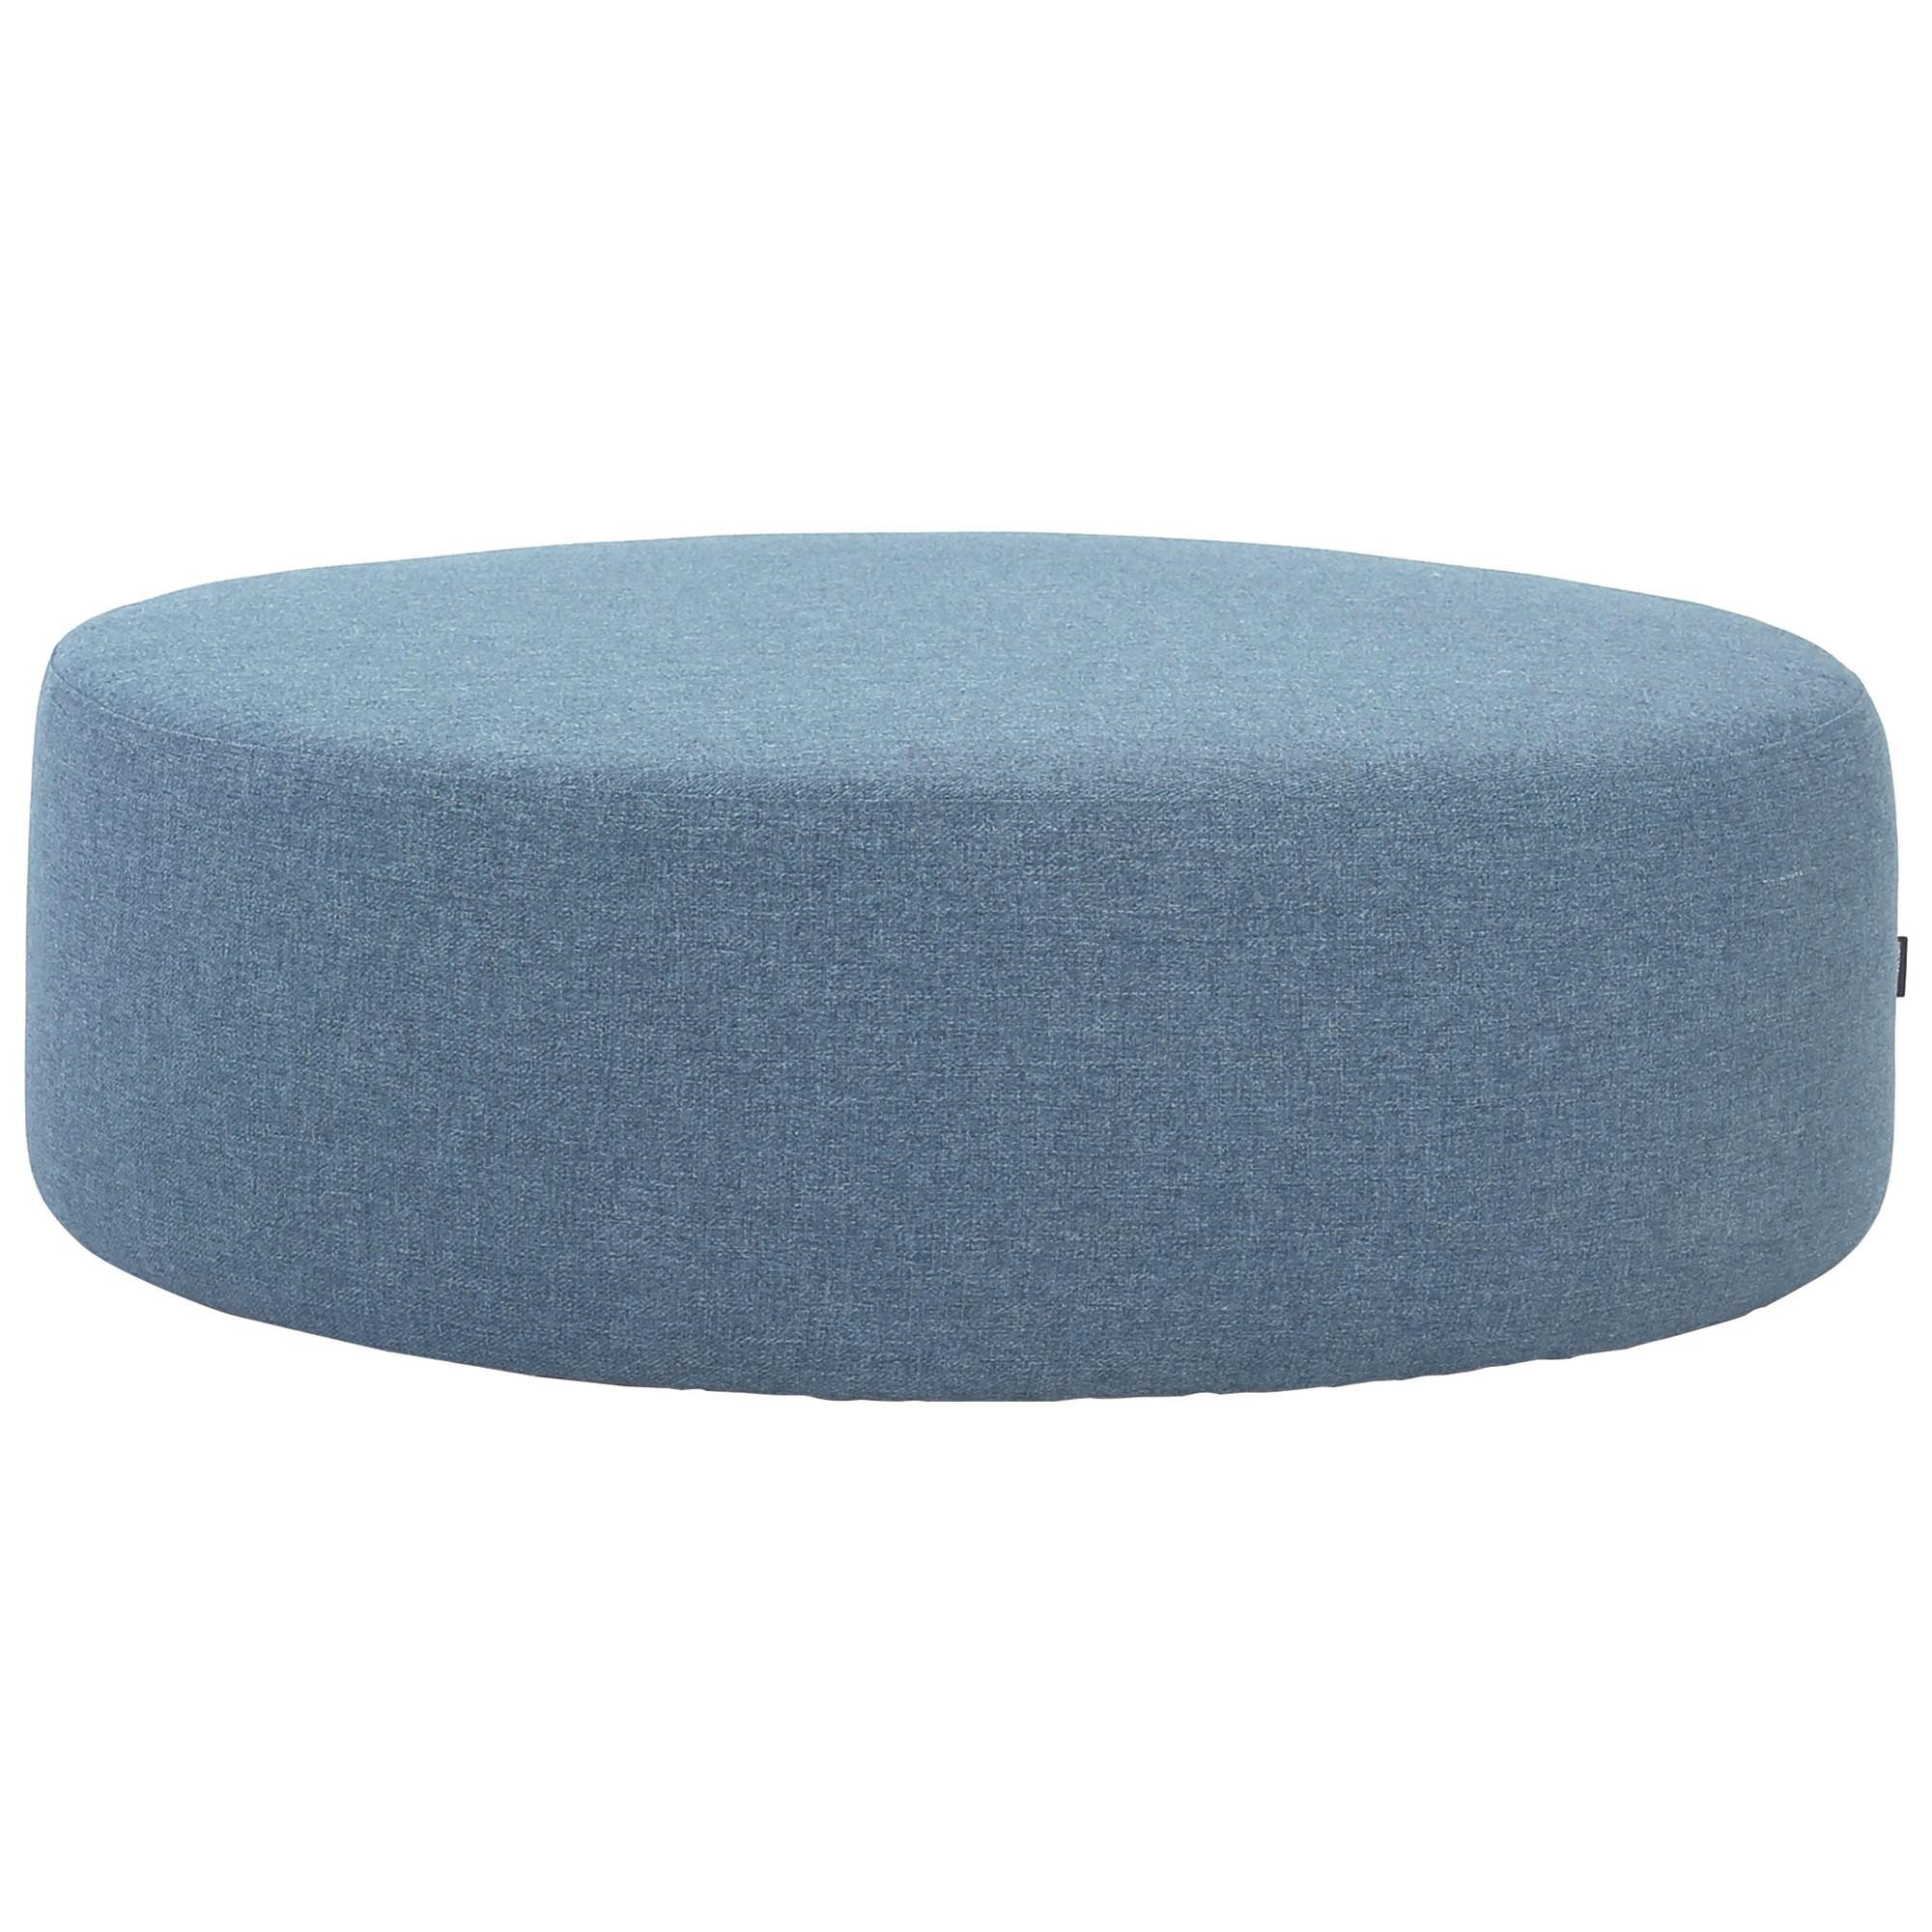 Omni Fabric Round Ottoman, 96cm, Blue